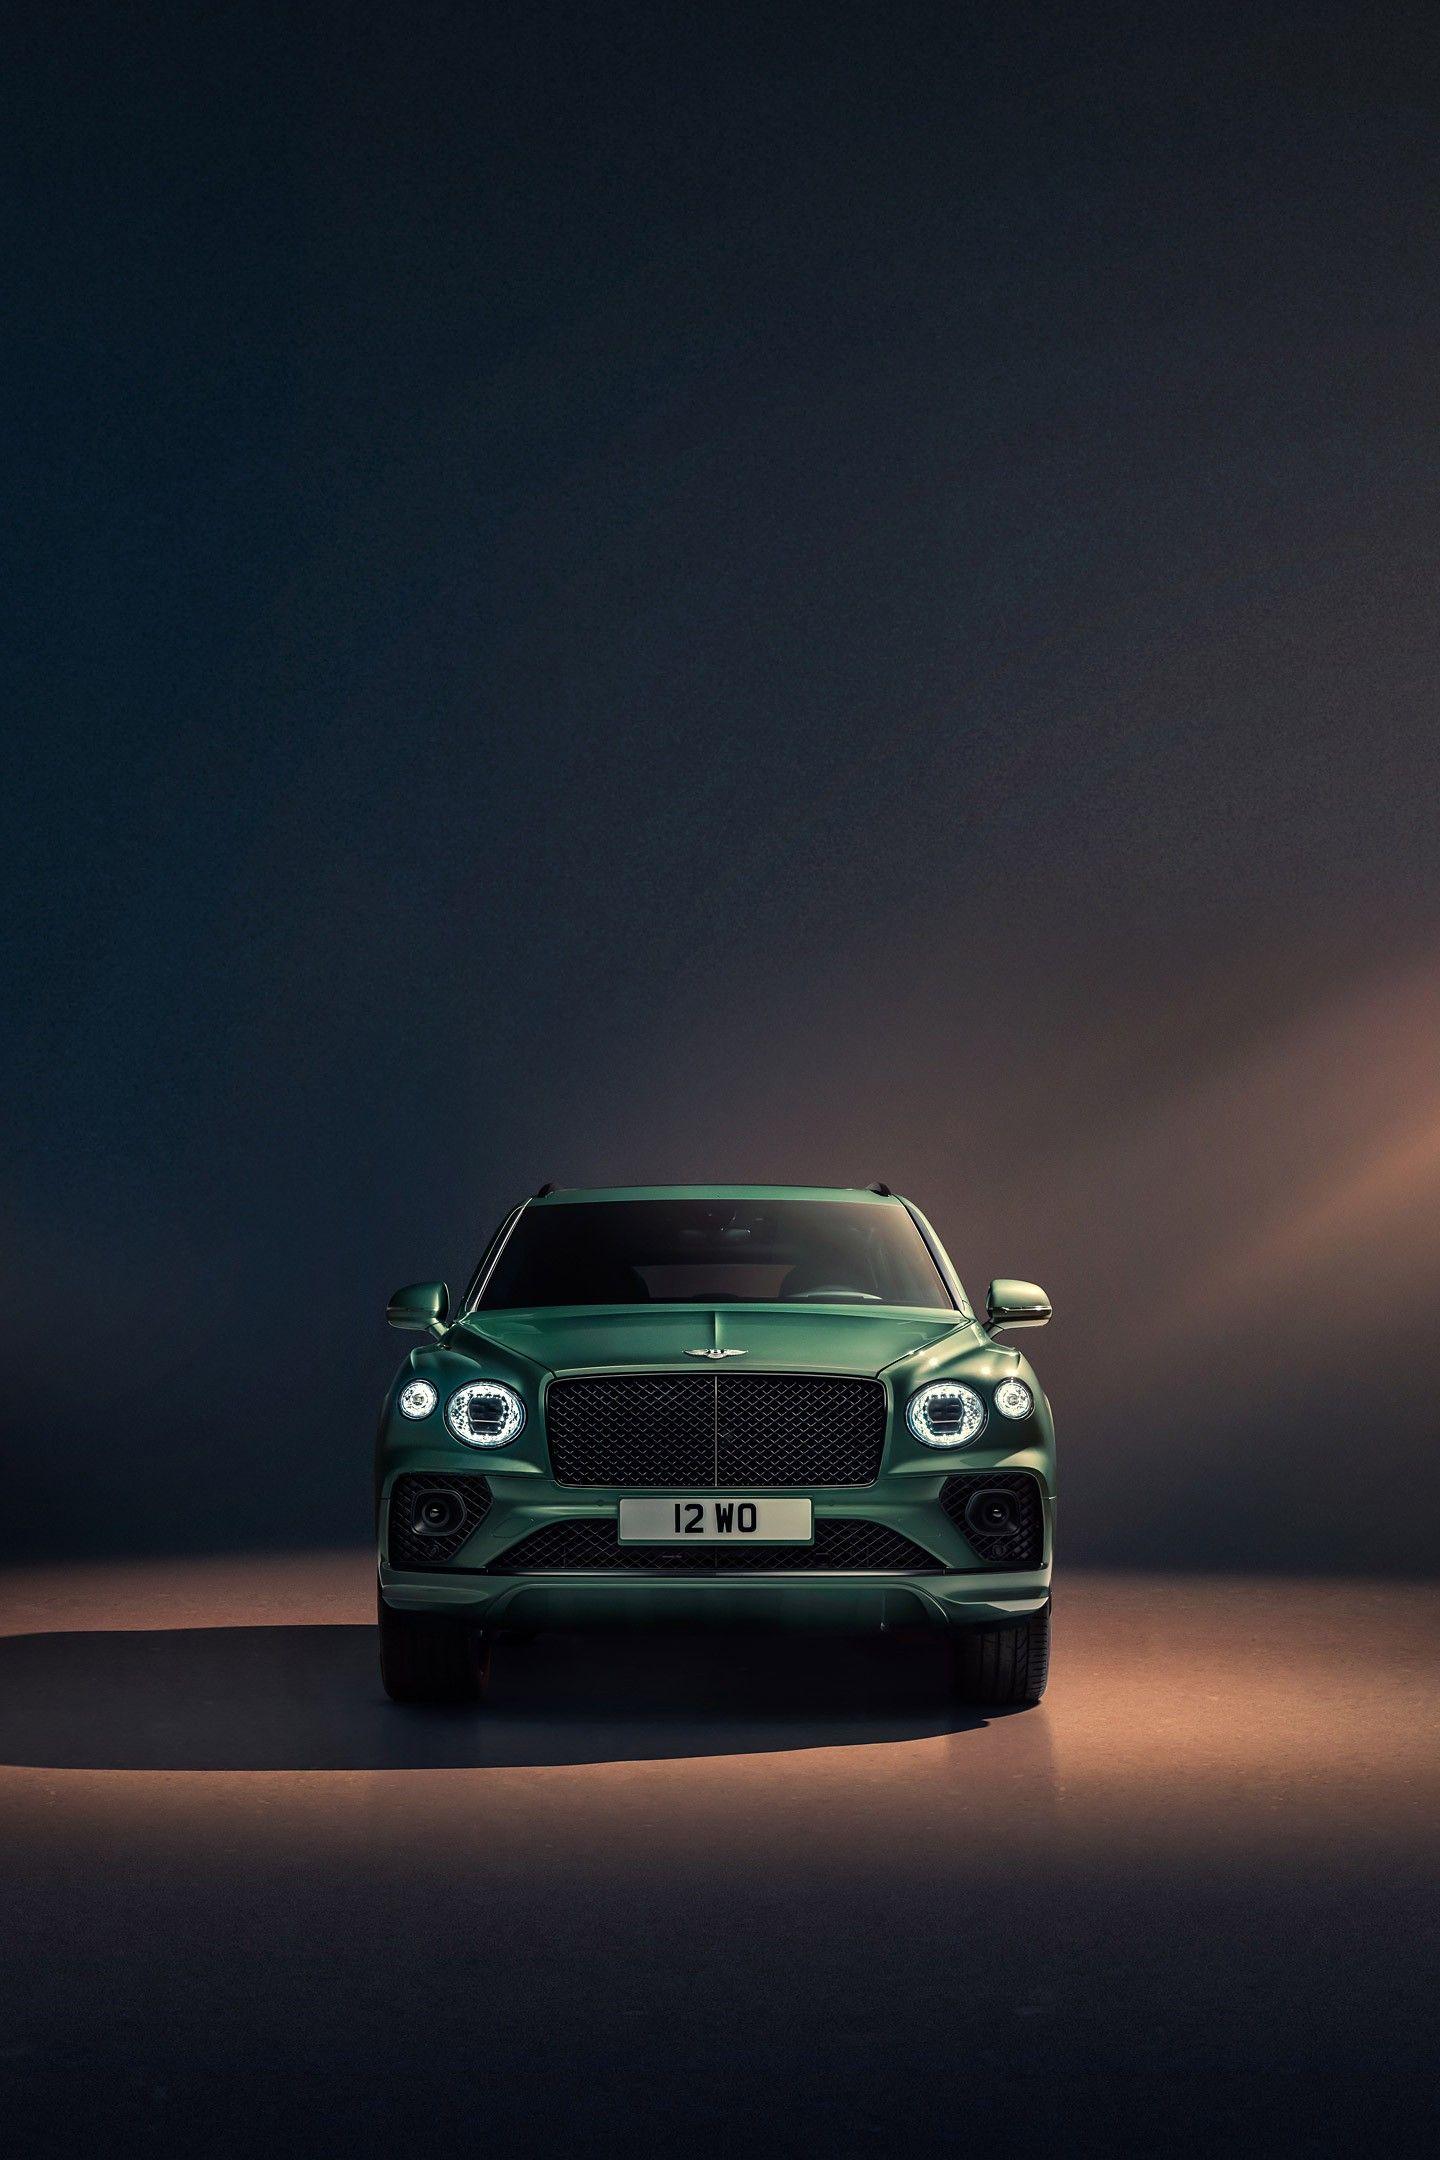 Bentley Full Hd Wallpapers 1440x2160 In 2021 Super Cars Google Pixel Wallpaper Full Hd Wallpaper